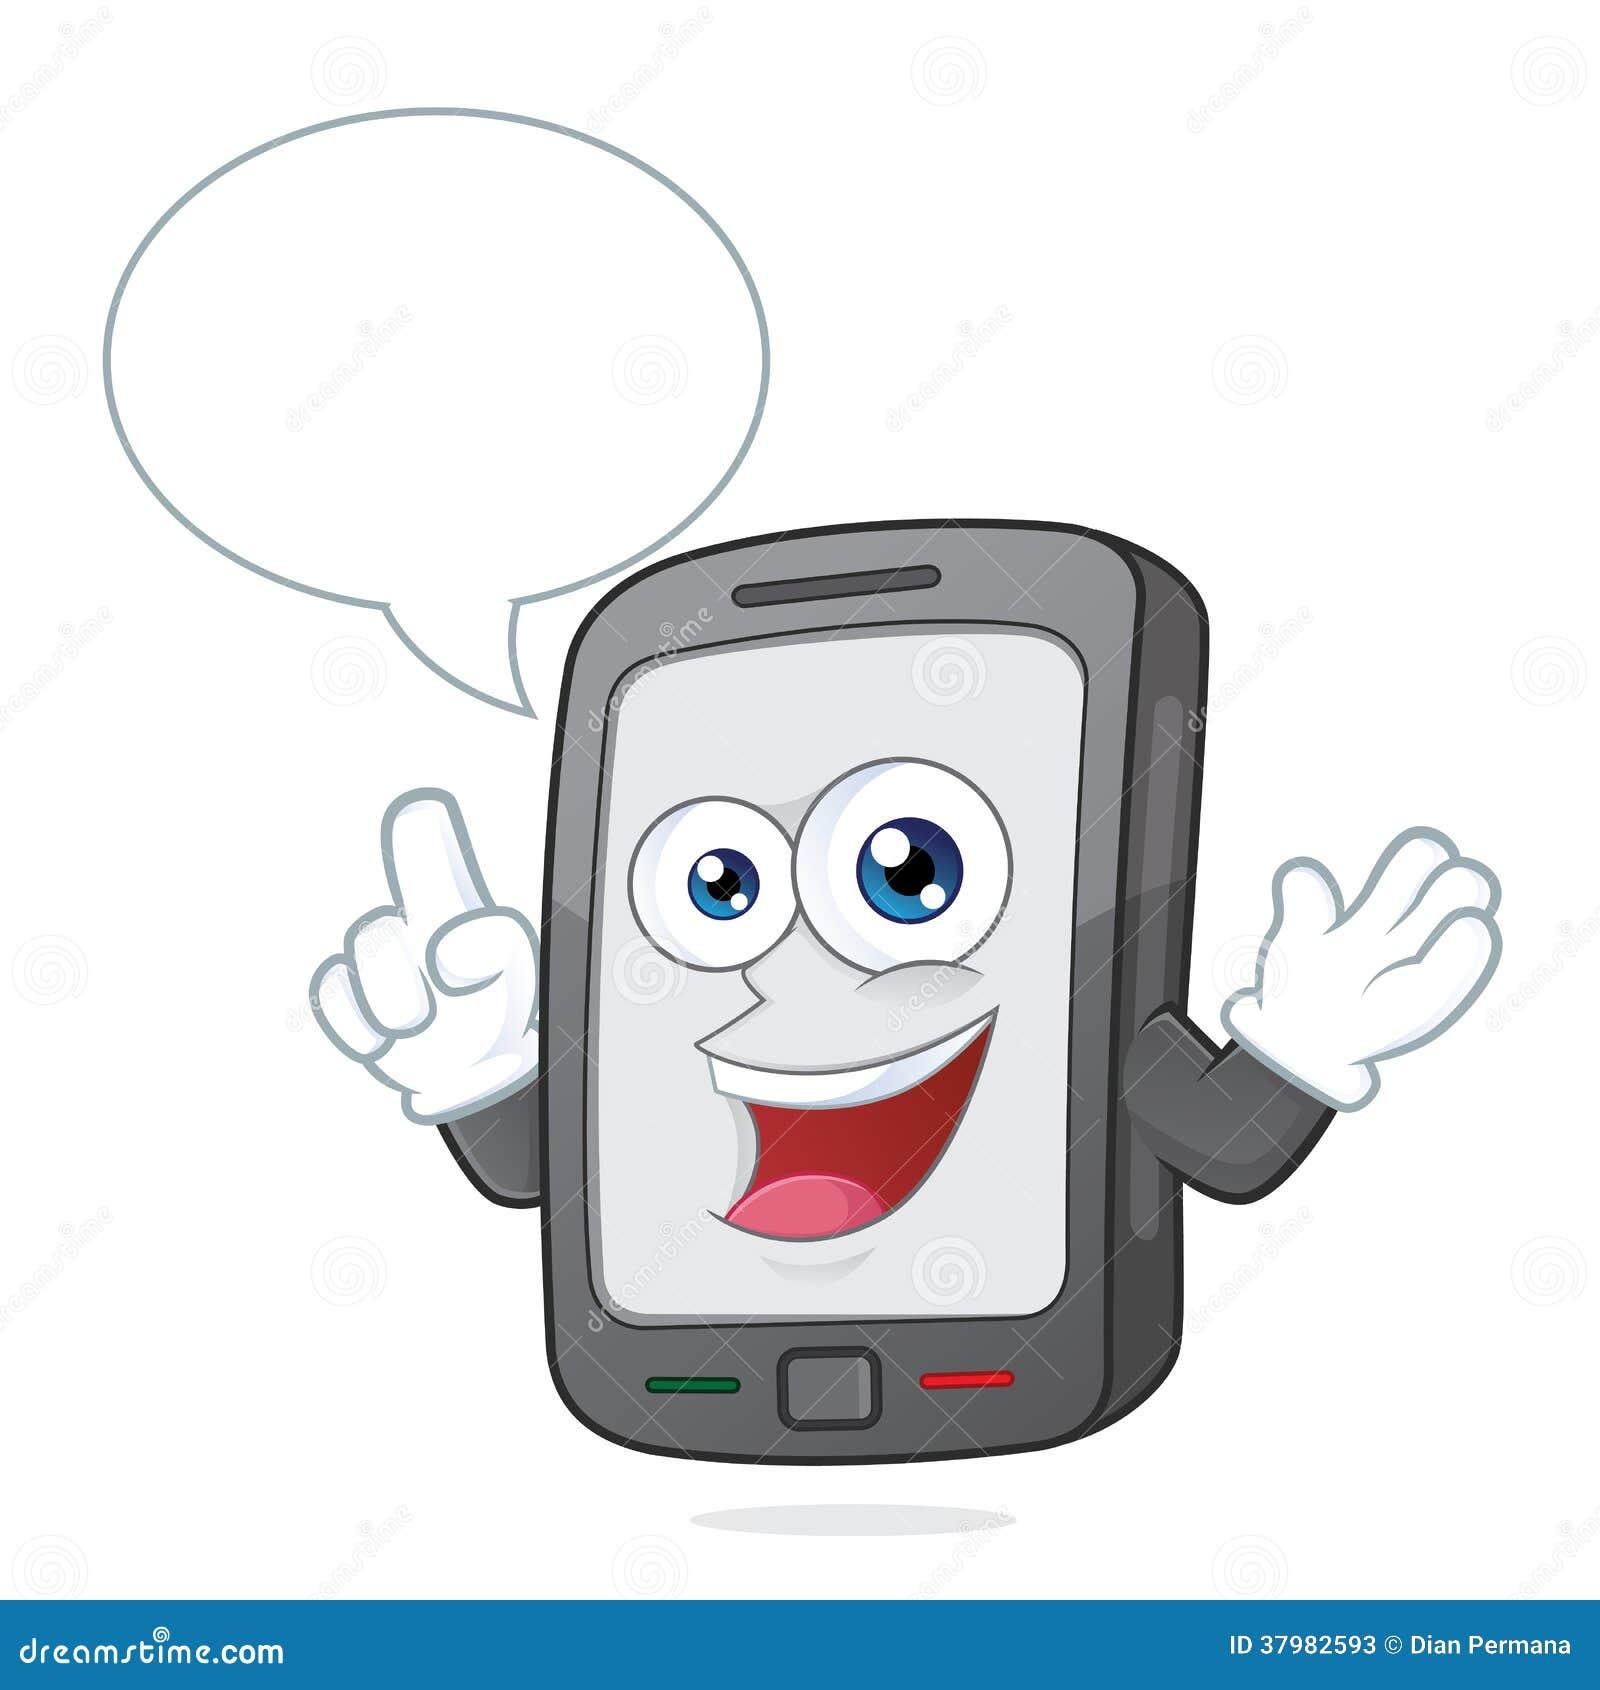 smartphone clipart - photo #40